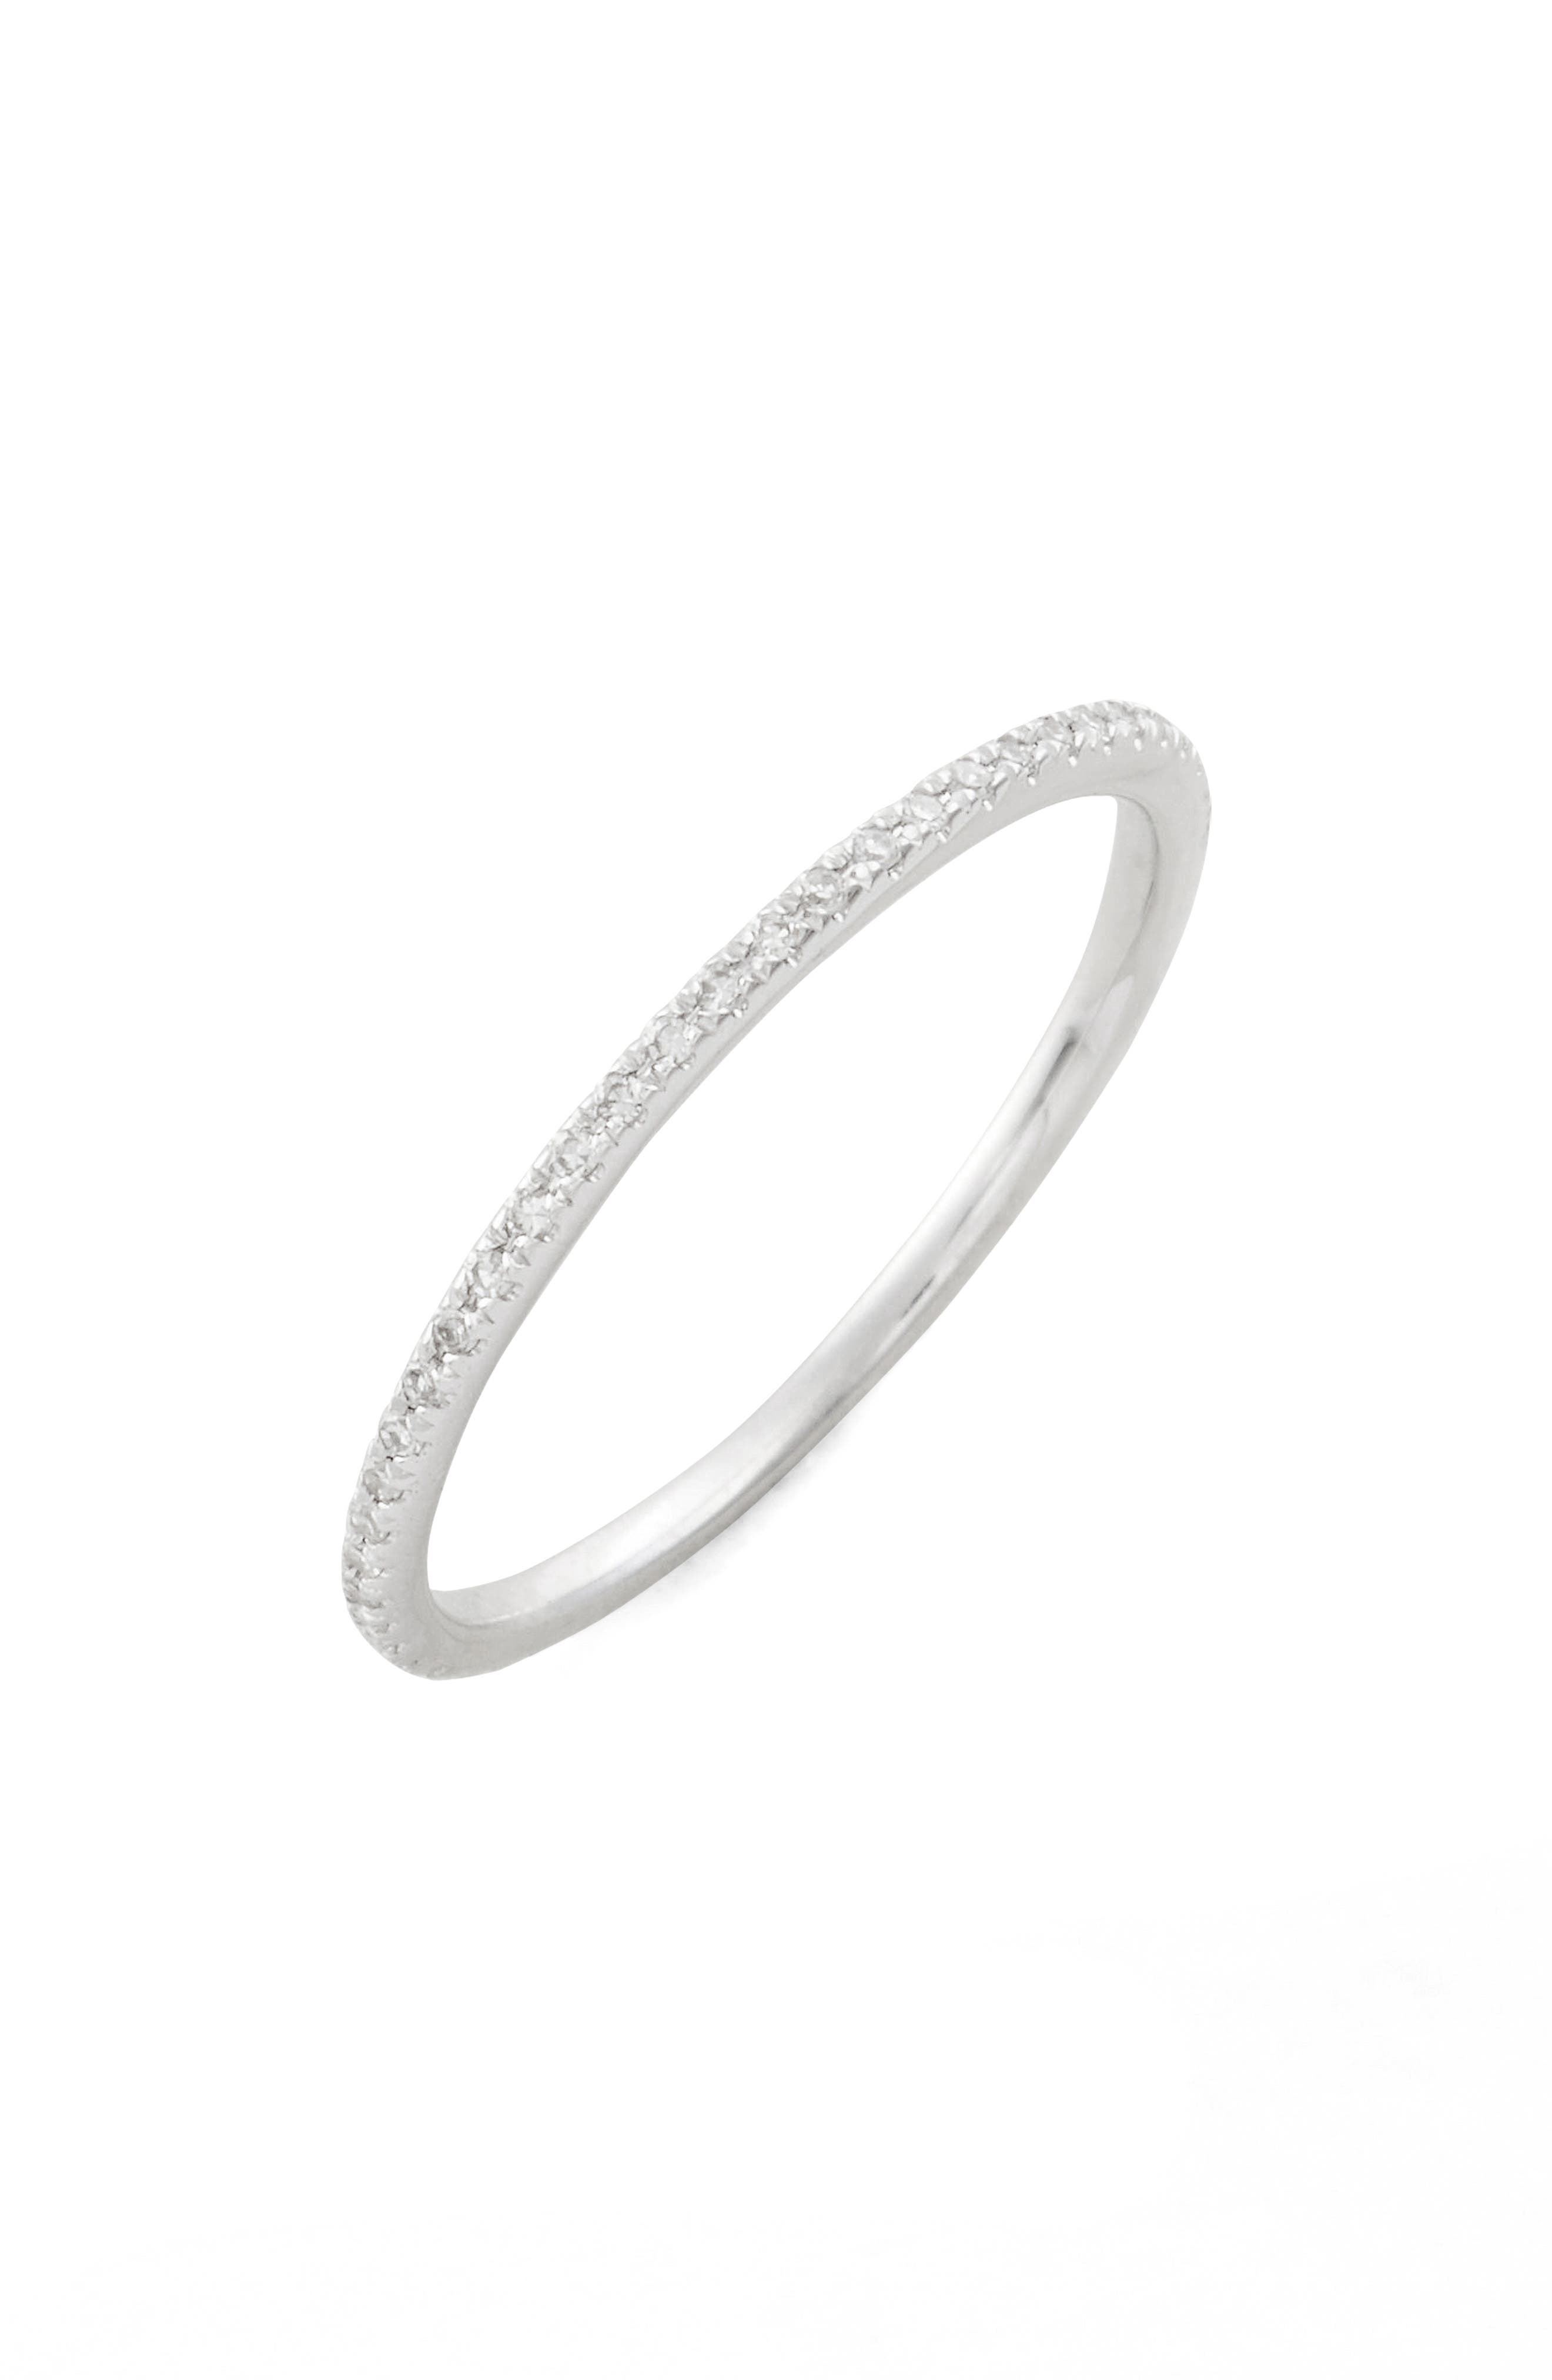 Two-Tone Diamond Stack Ring,                             Main thumbnail 1, color,                             WHITE GOLD